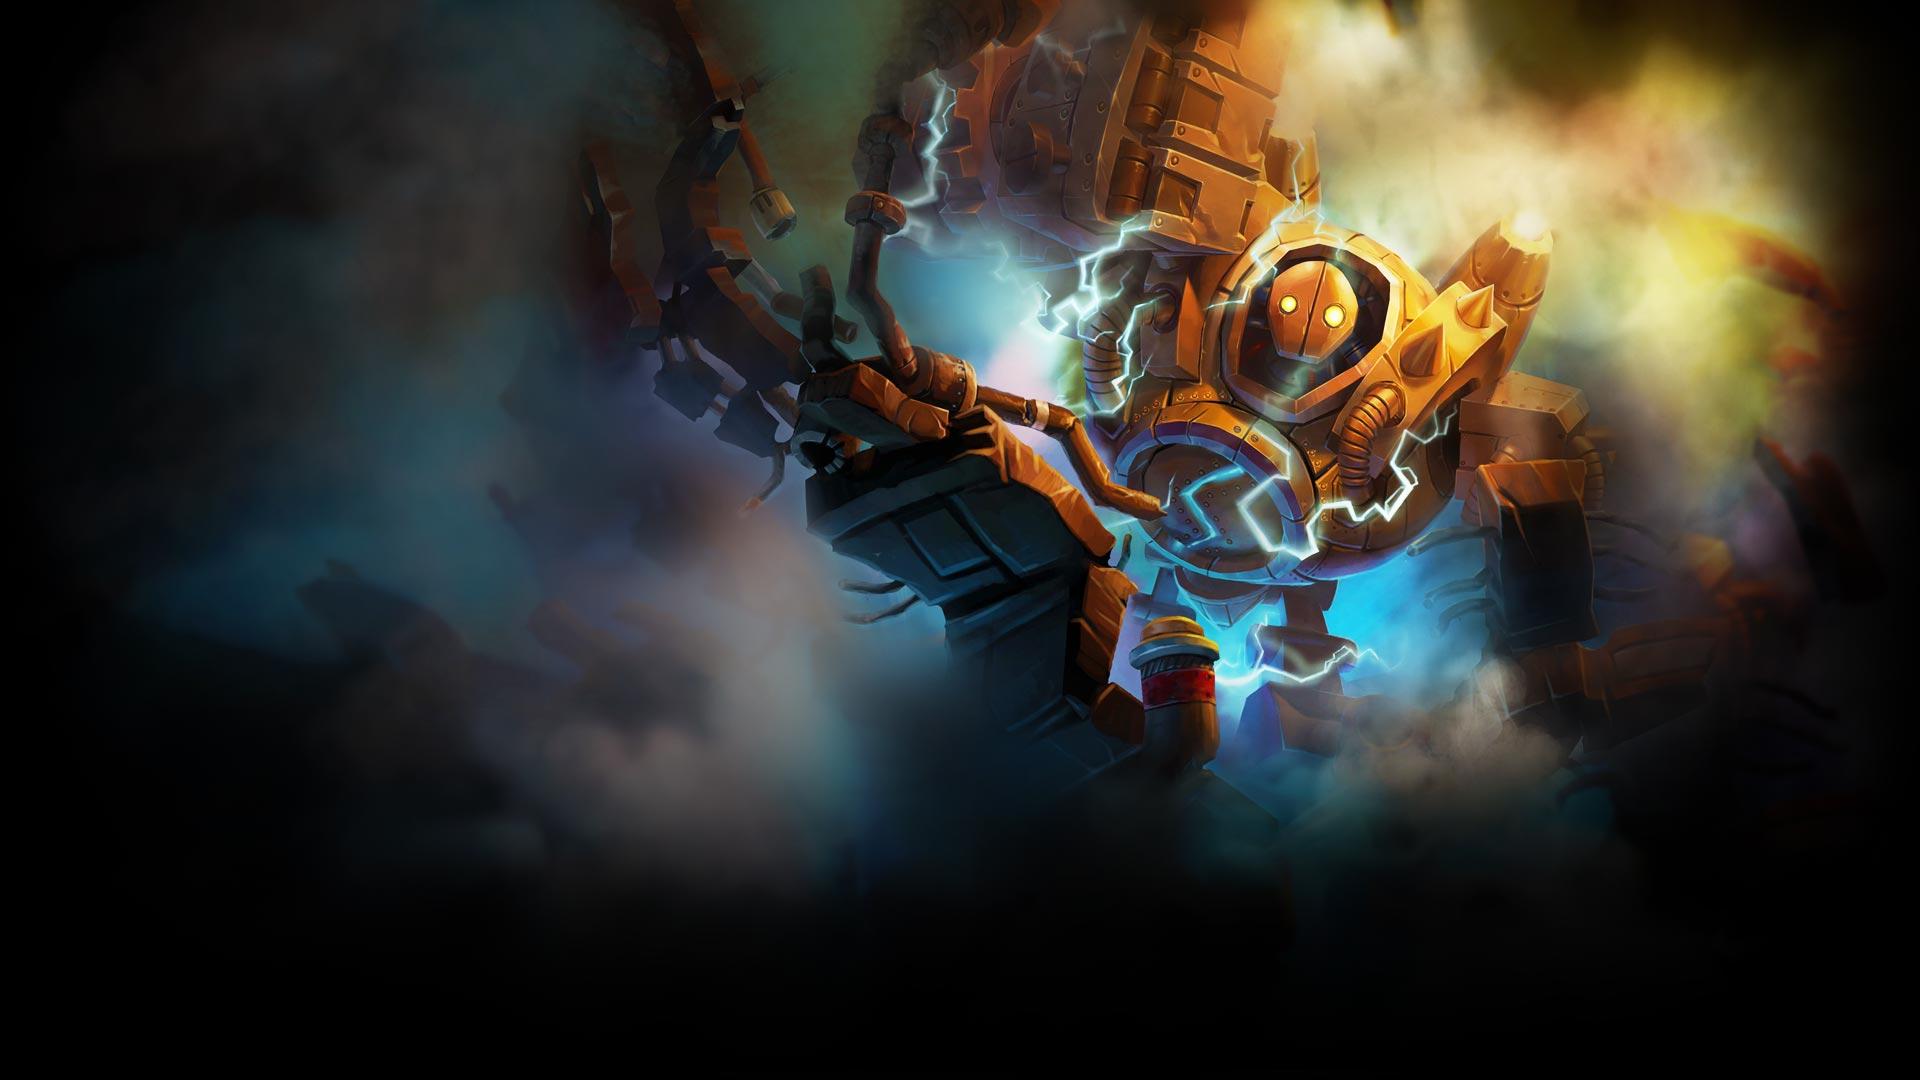 Blitzcrank Artwork - League of Legends Wallpapers